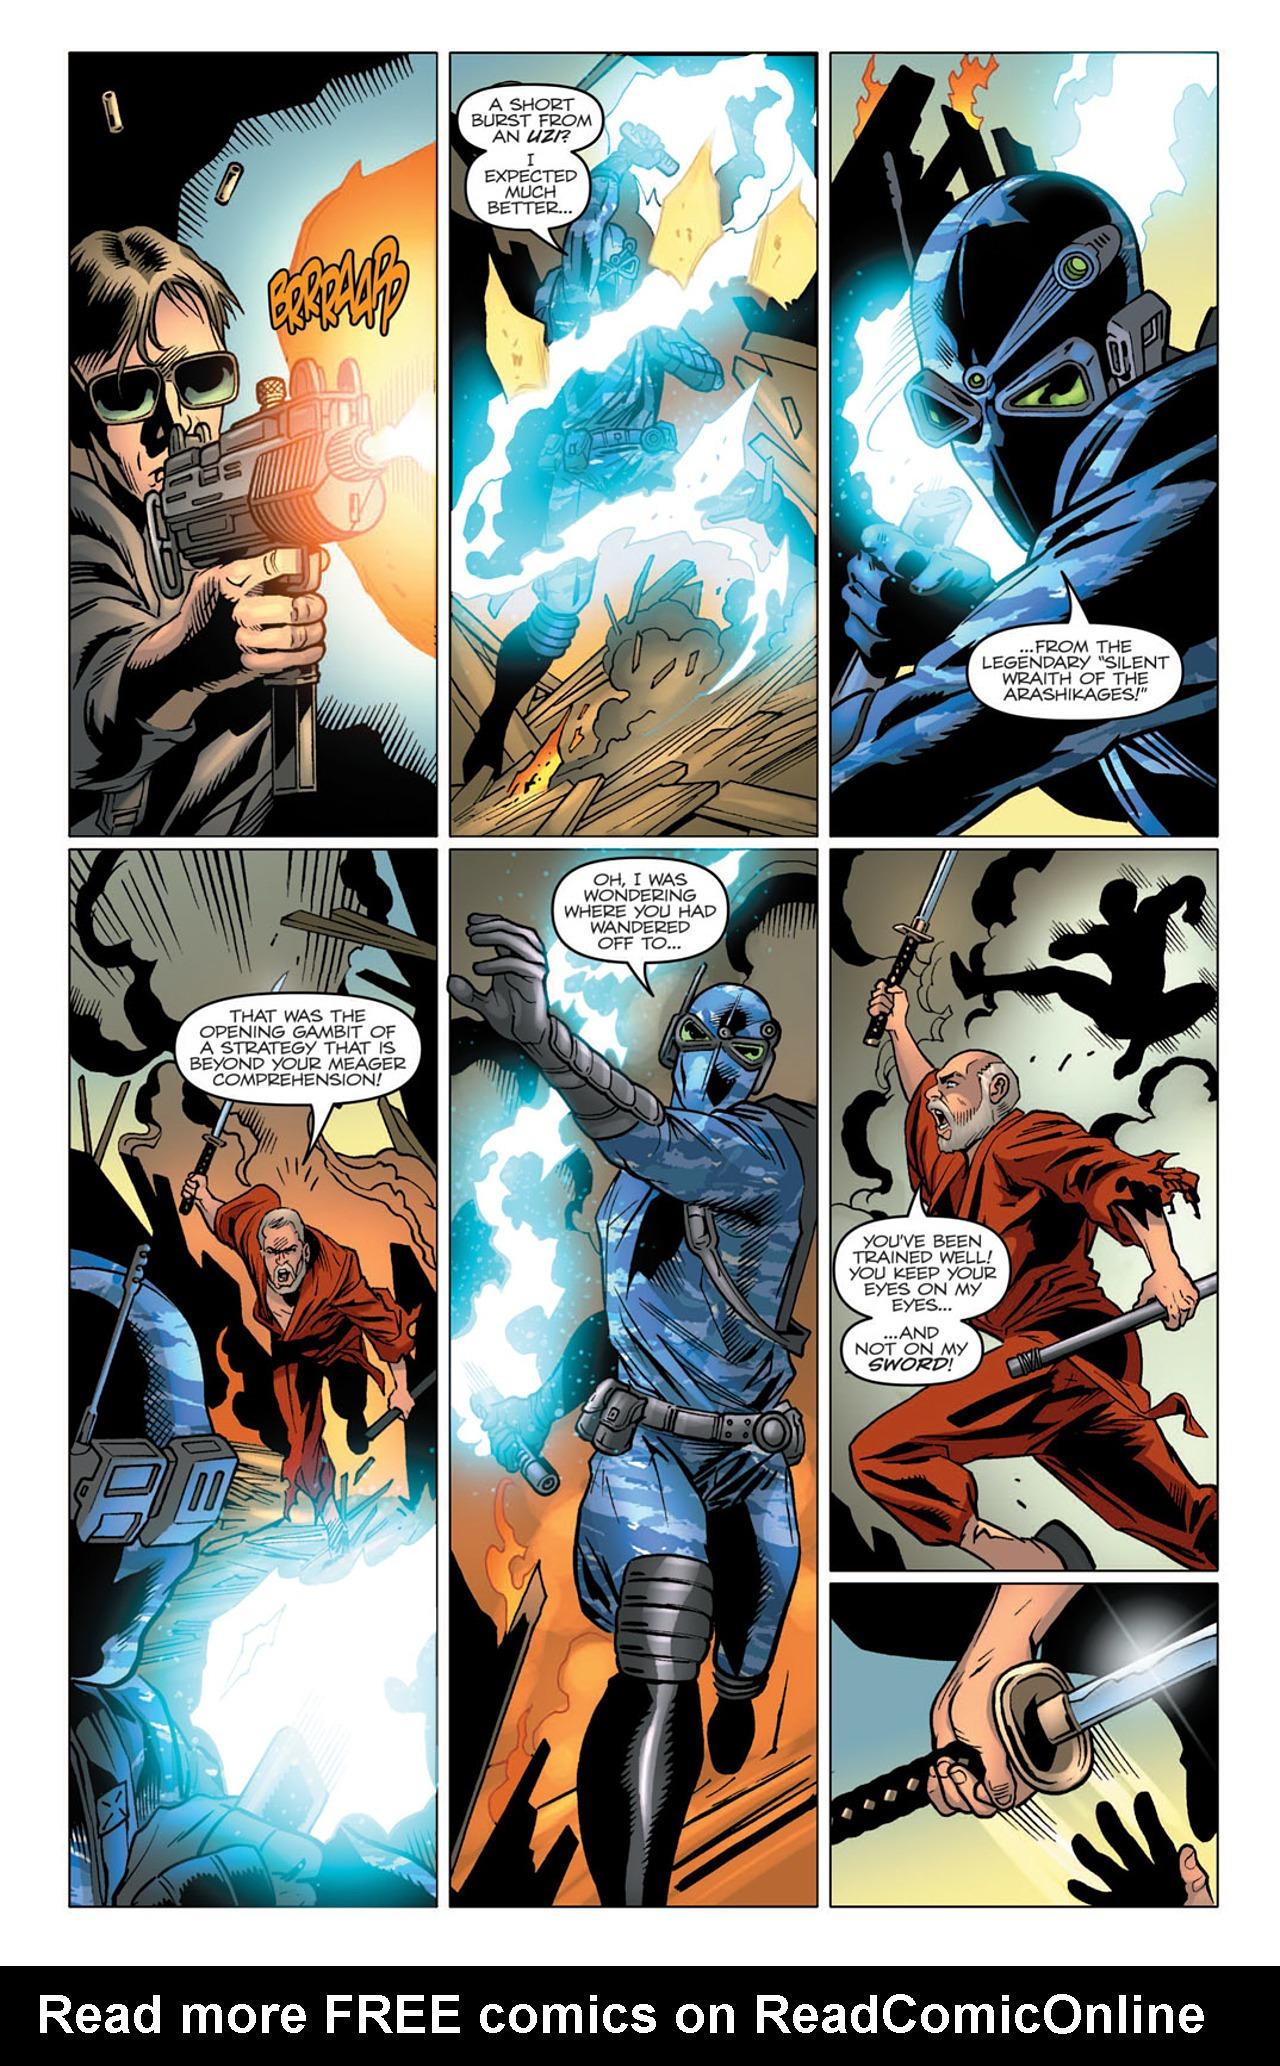 G.I. Joe: A Real American Hero 172 Page 20